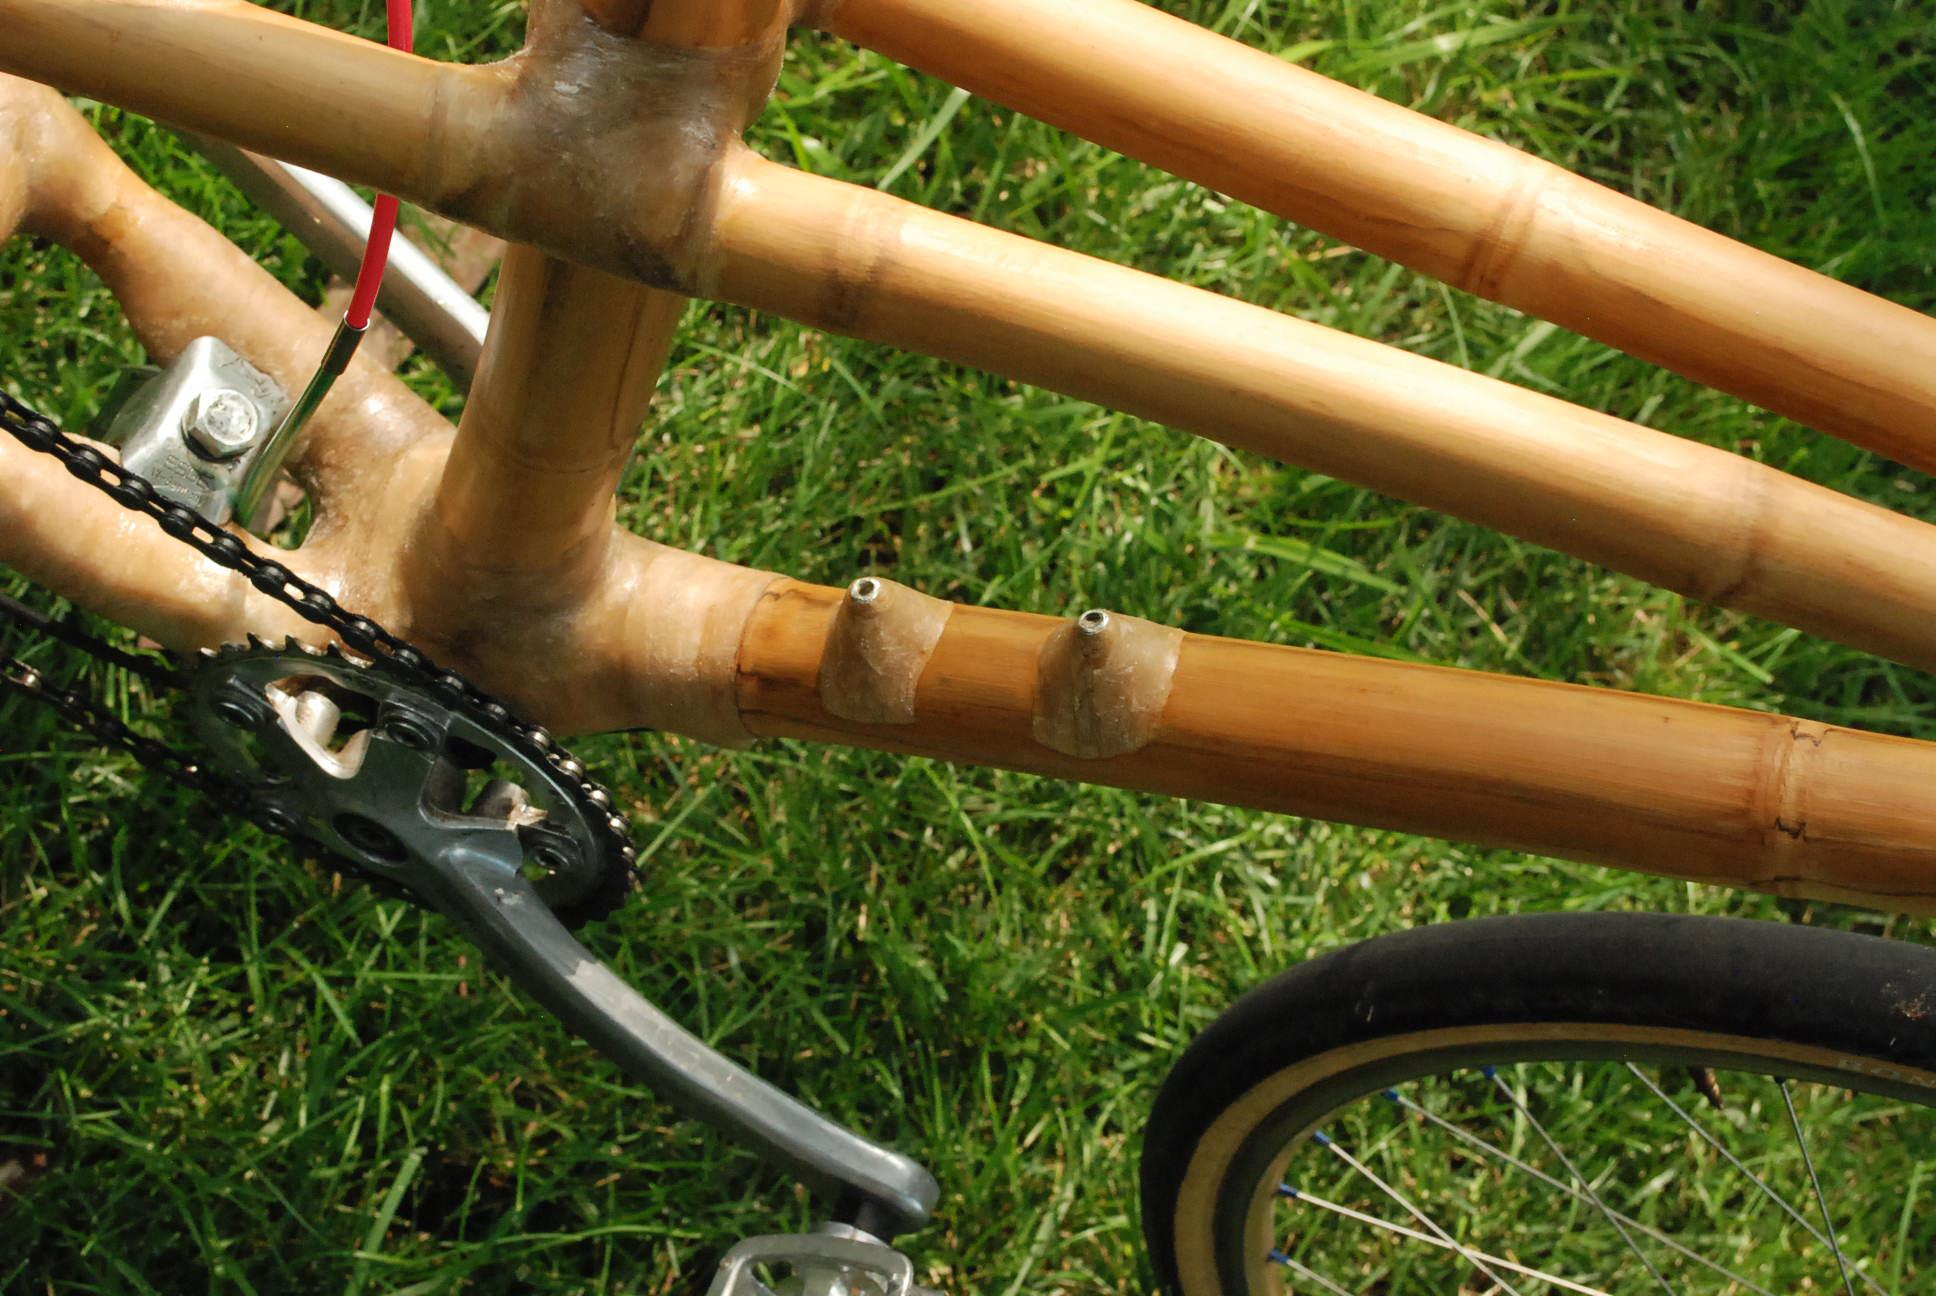 water bosses on bamboo bike